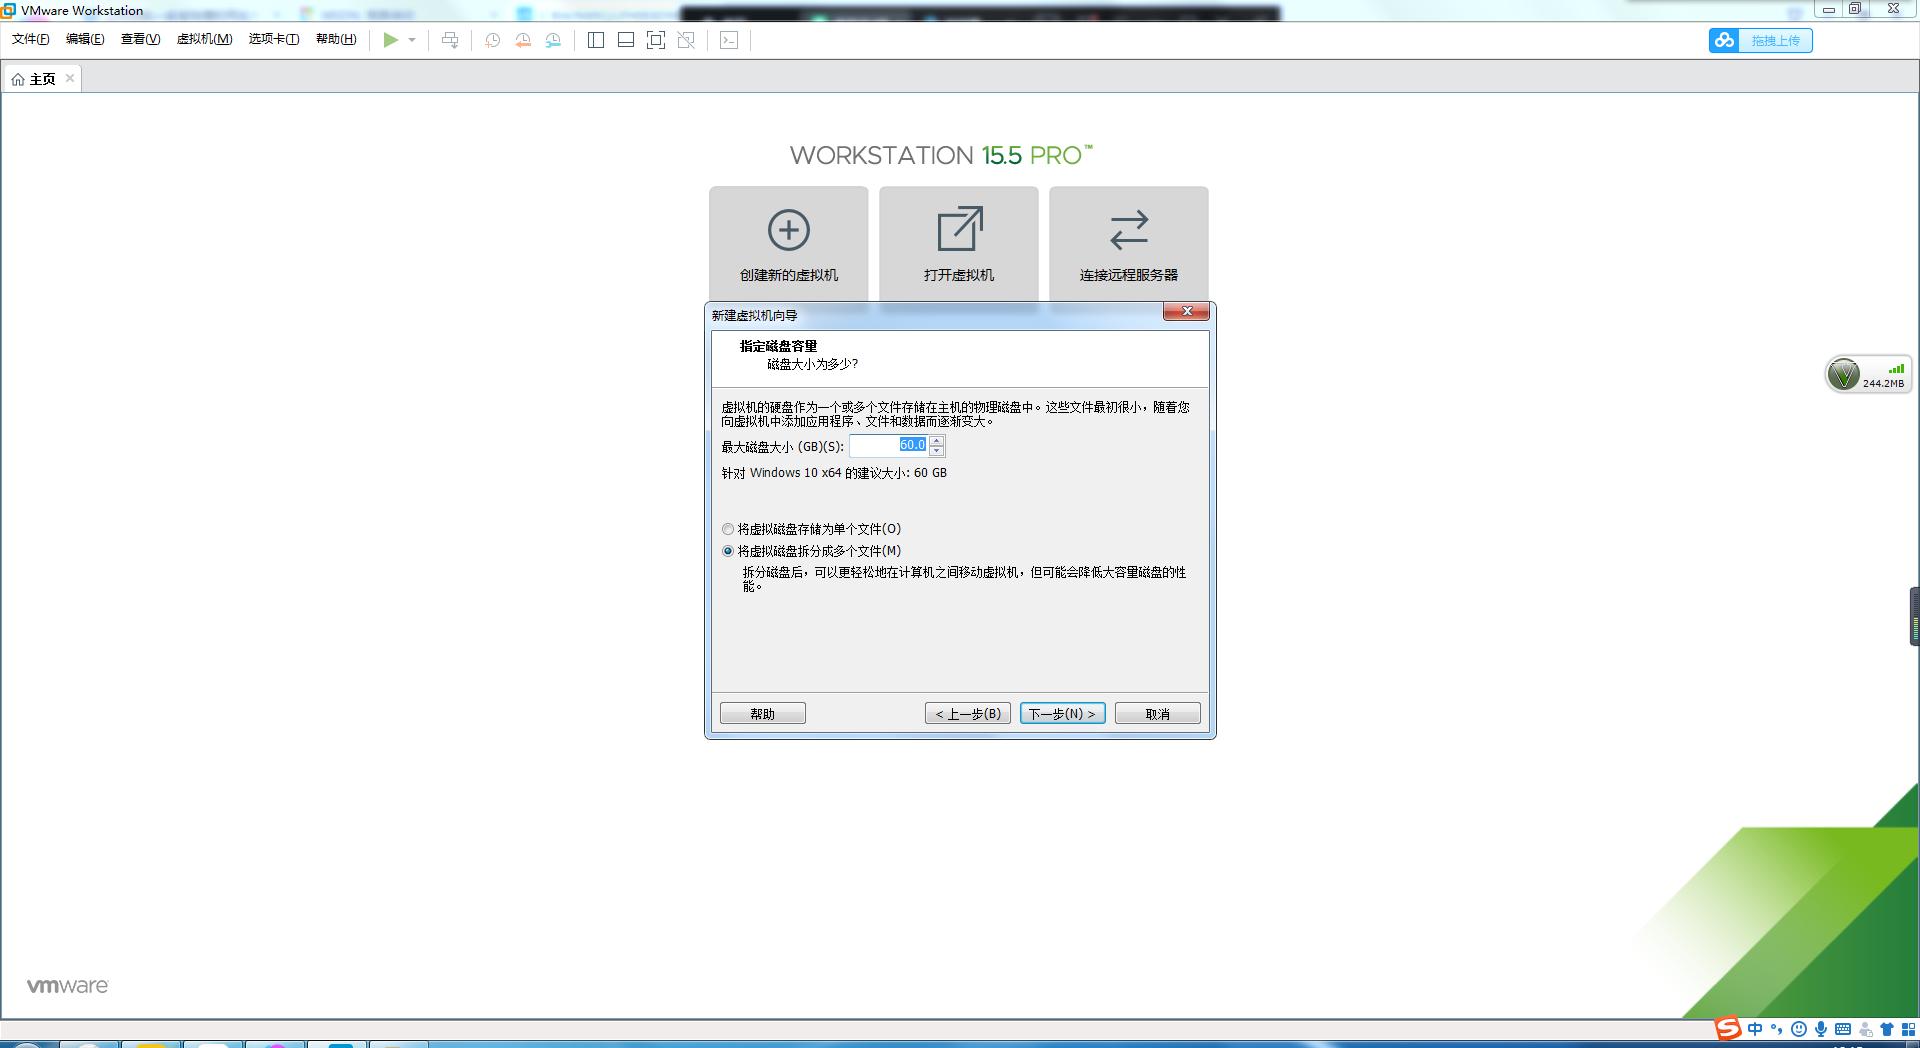 rBAAdmBpXFuAaDqLAAKgPa8PWTQ600.jpg插图(4)